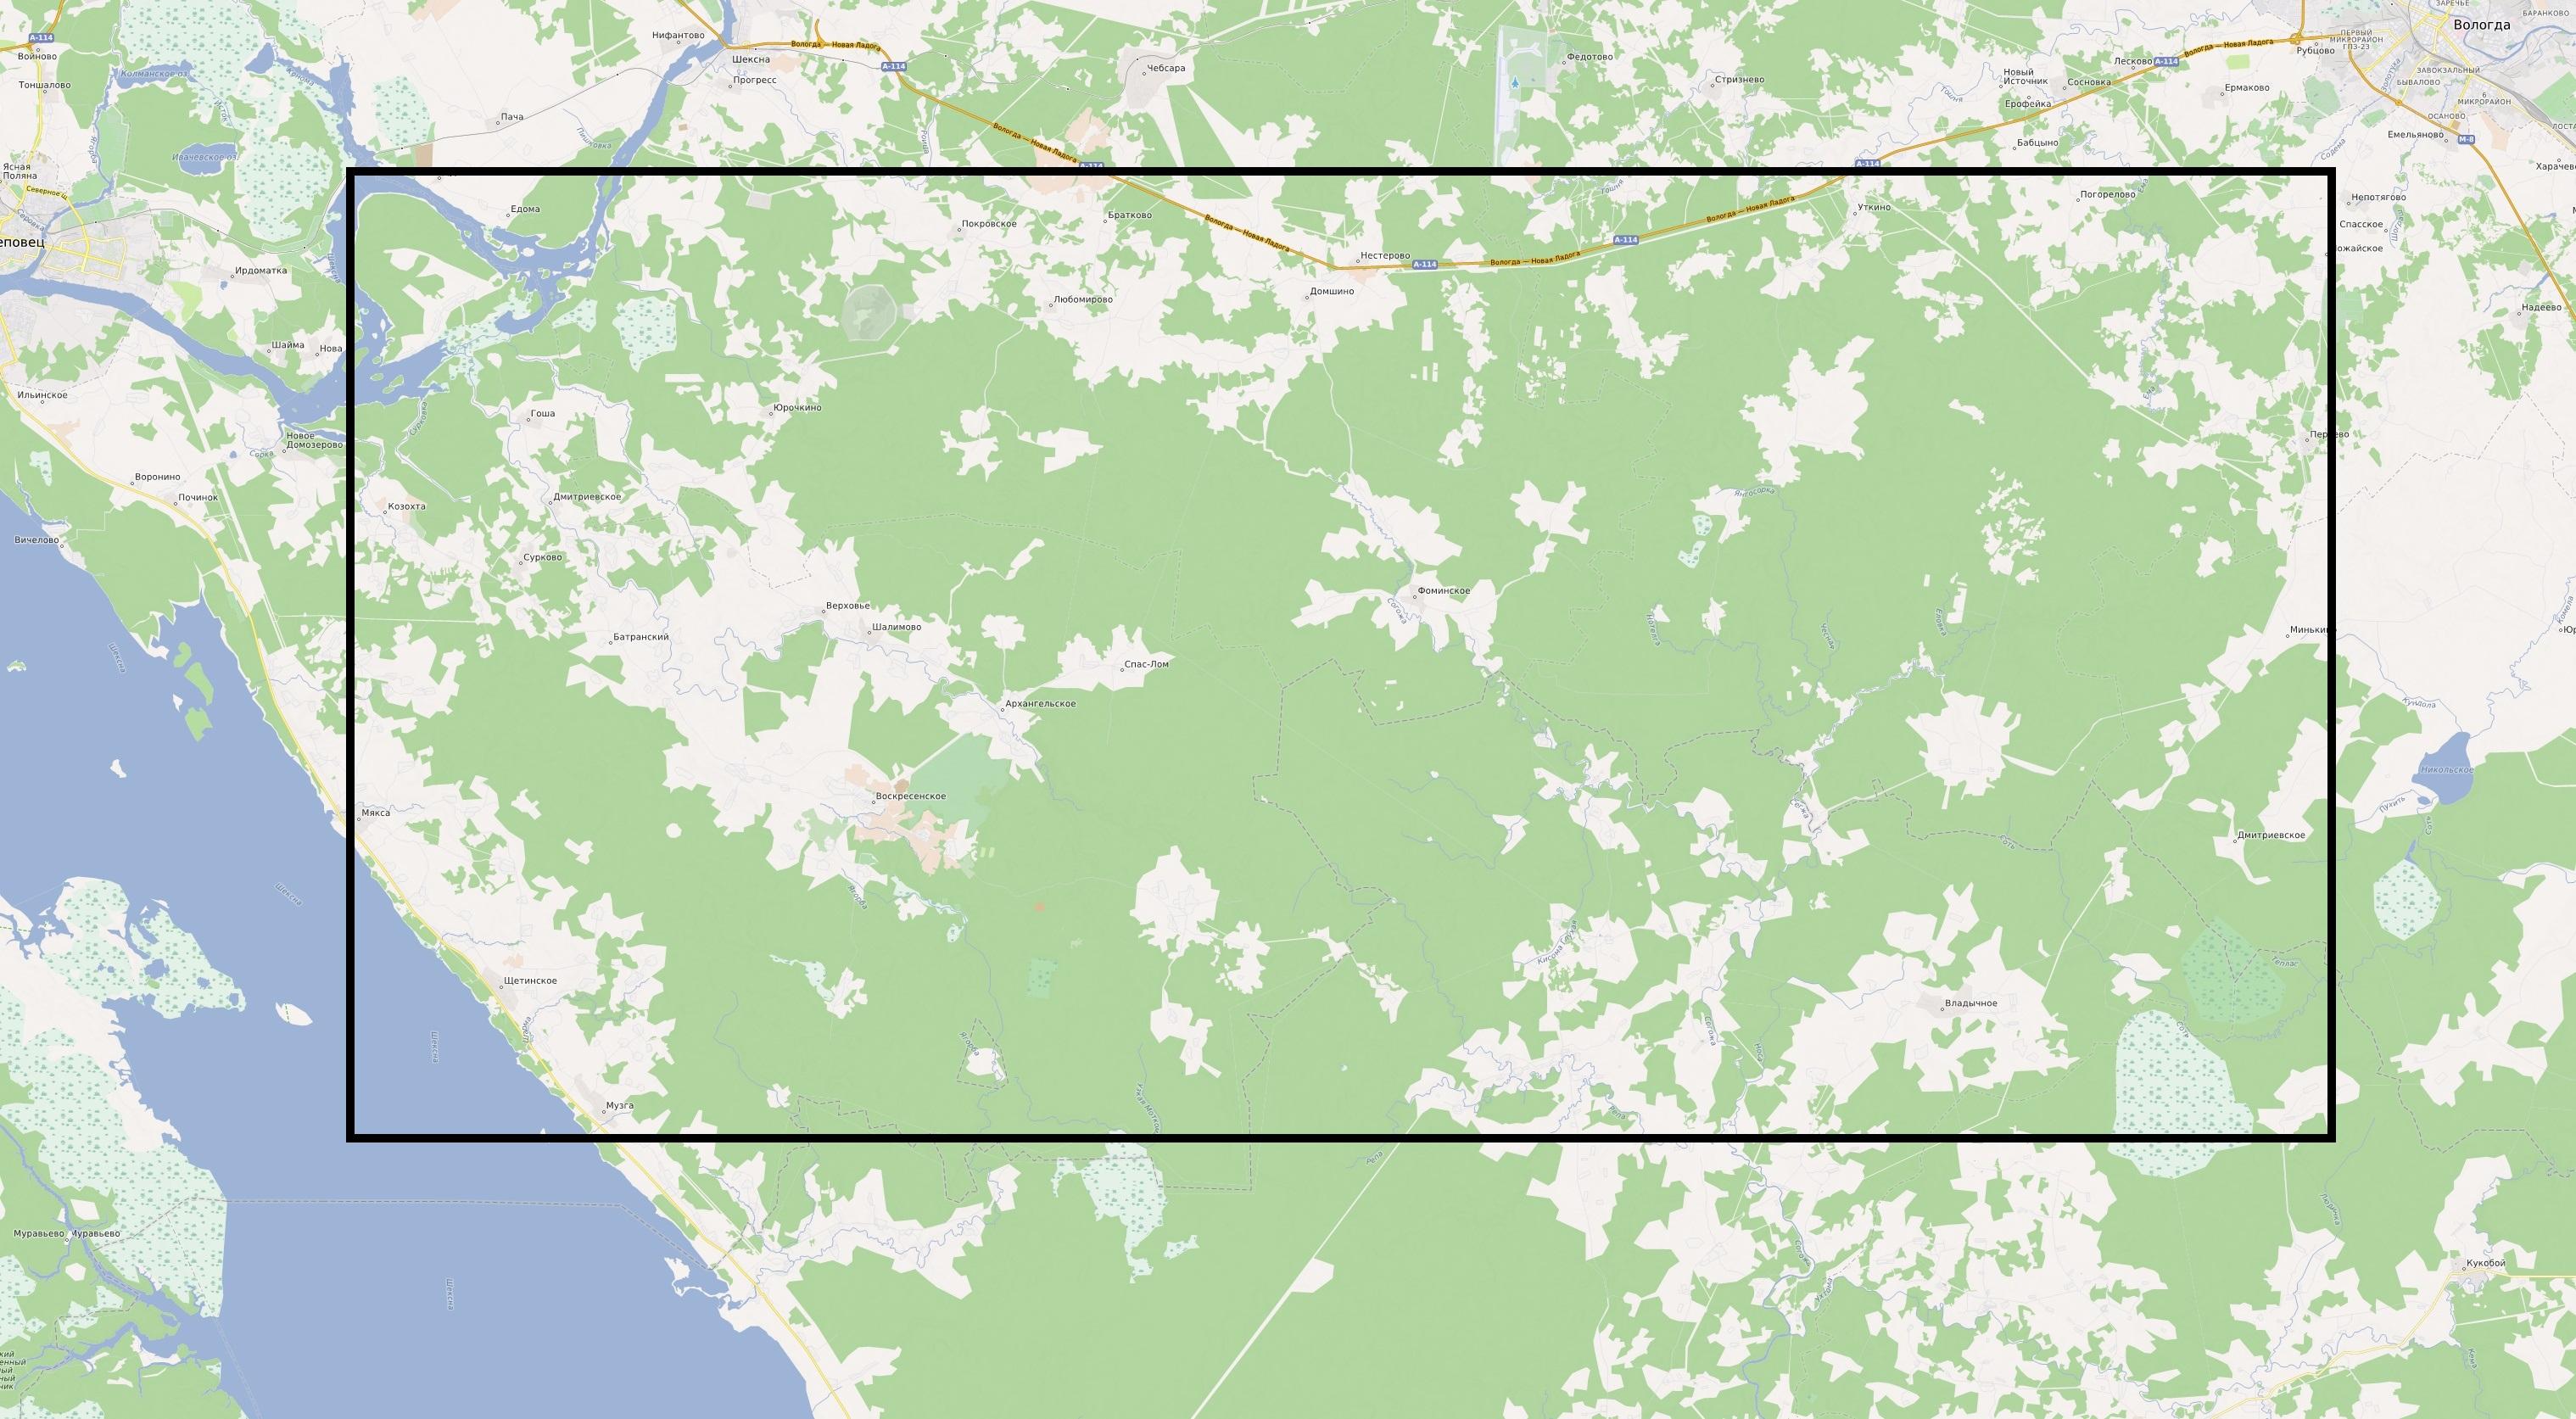 map2_3.jpg